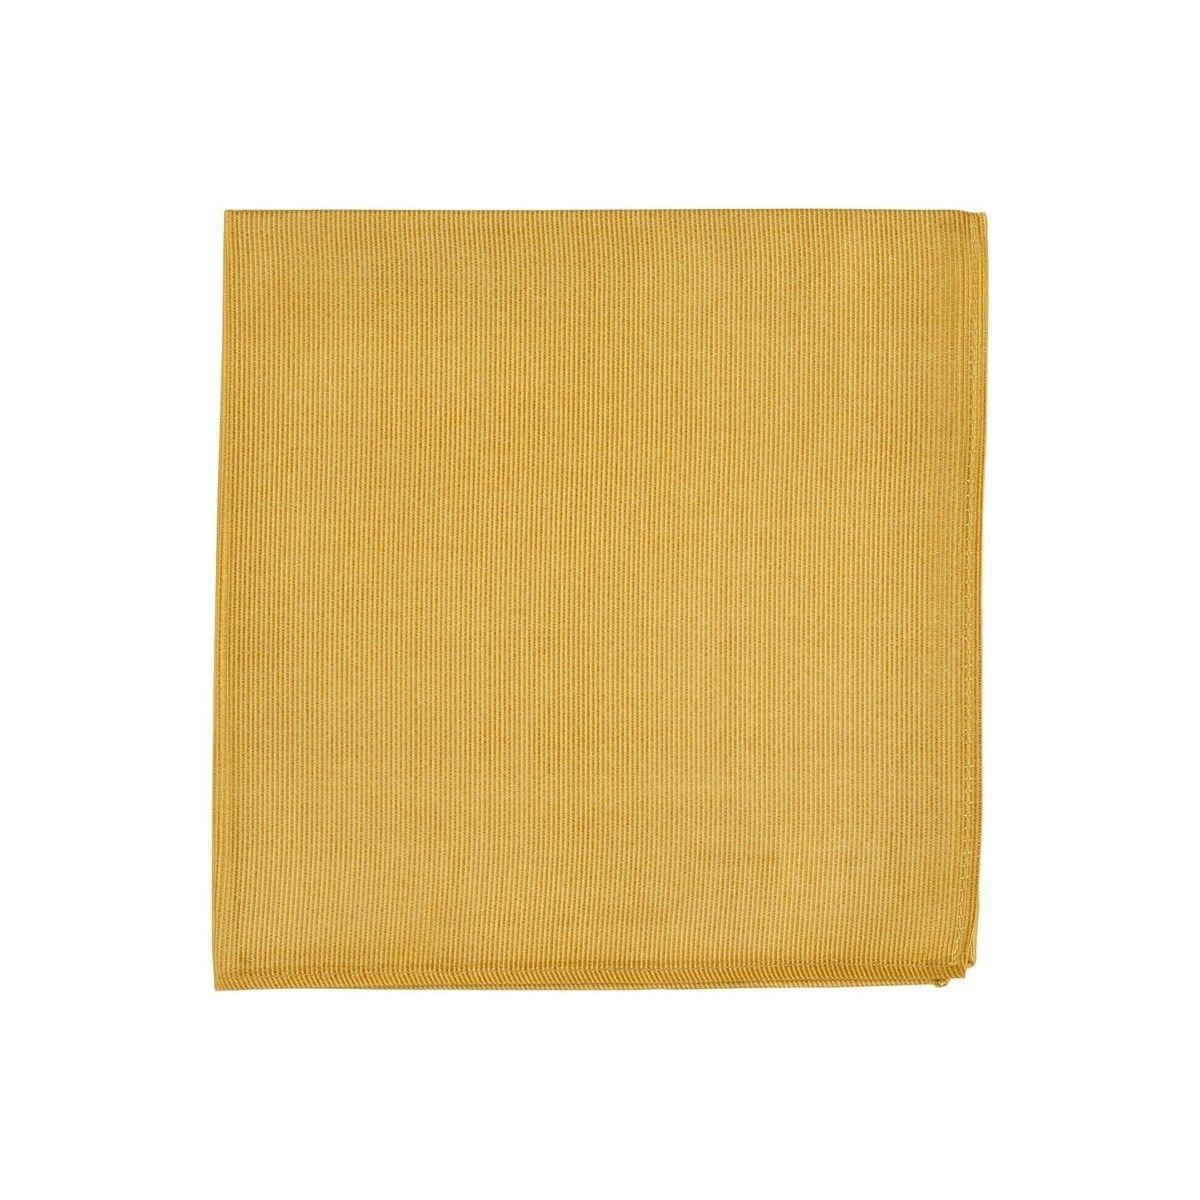 Pochette costume unie twill de soie